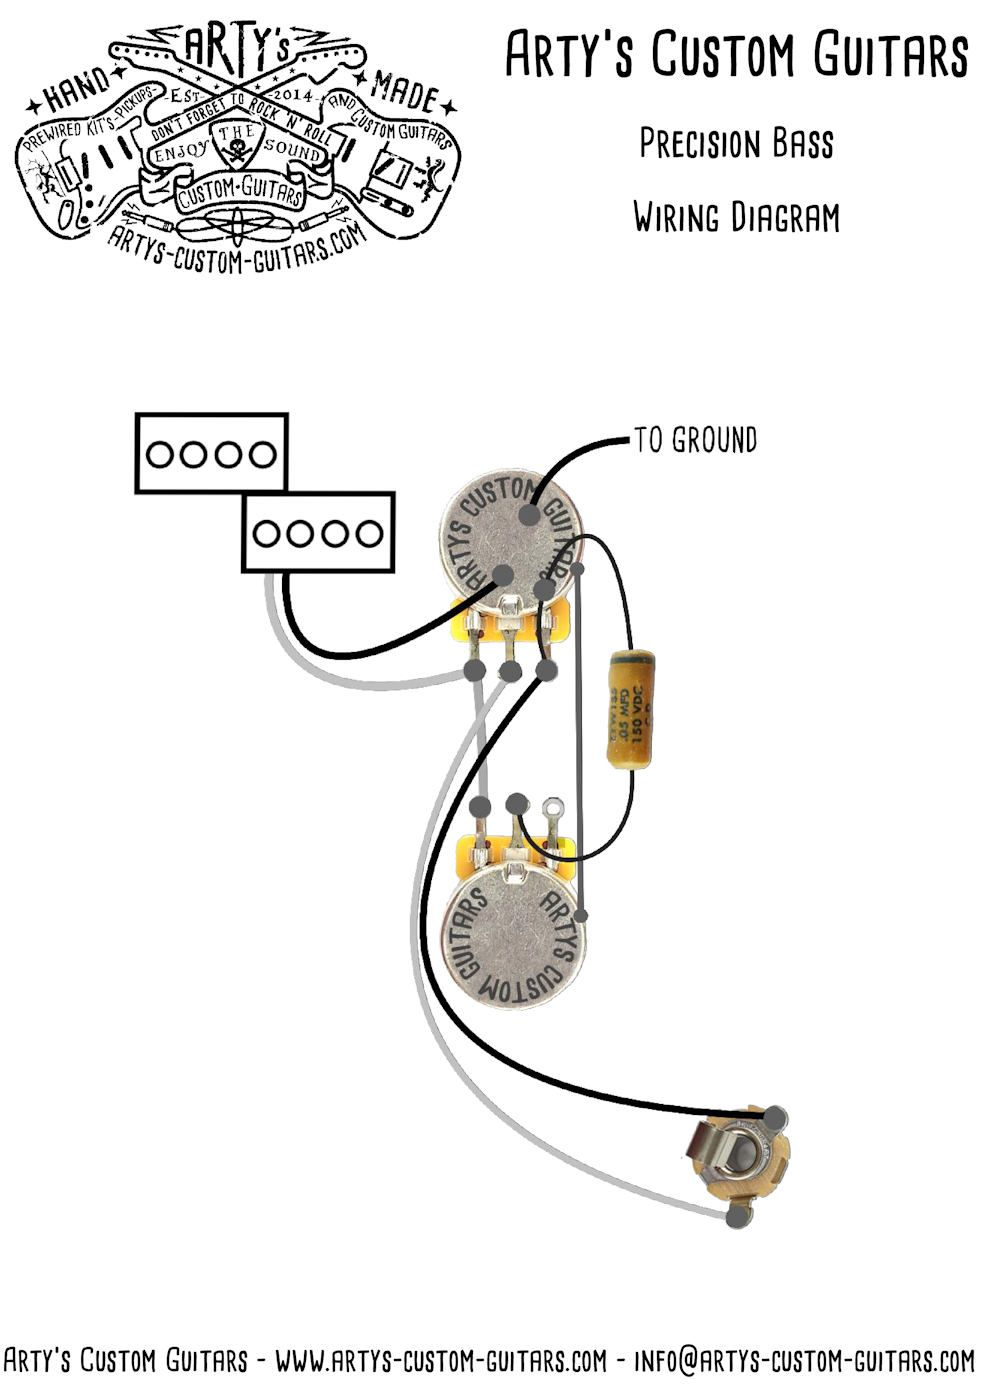 precision bass wiring diagram arty s custom guitars [ 990 x 1400 Pixel ]